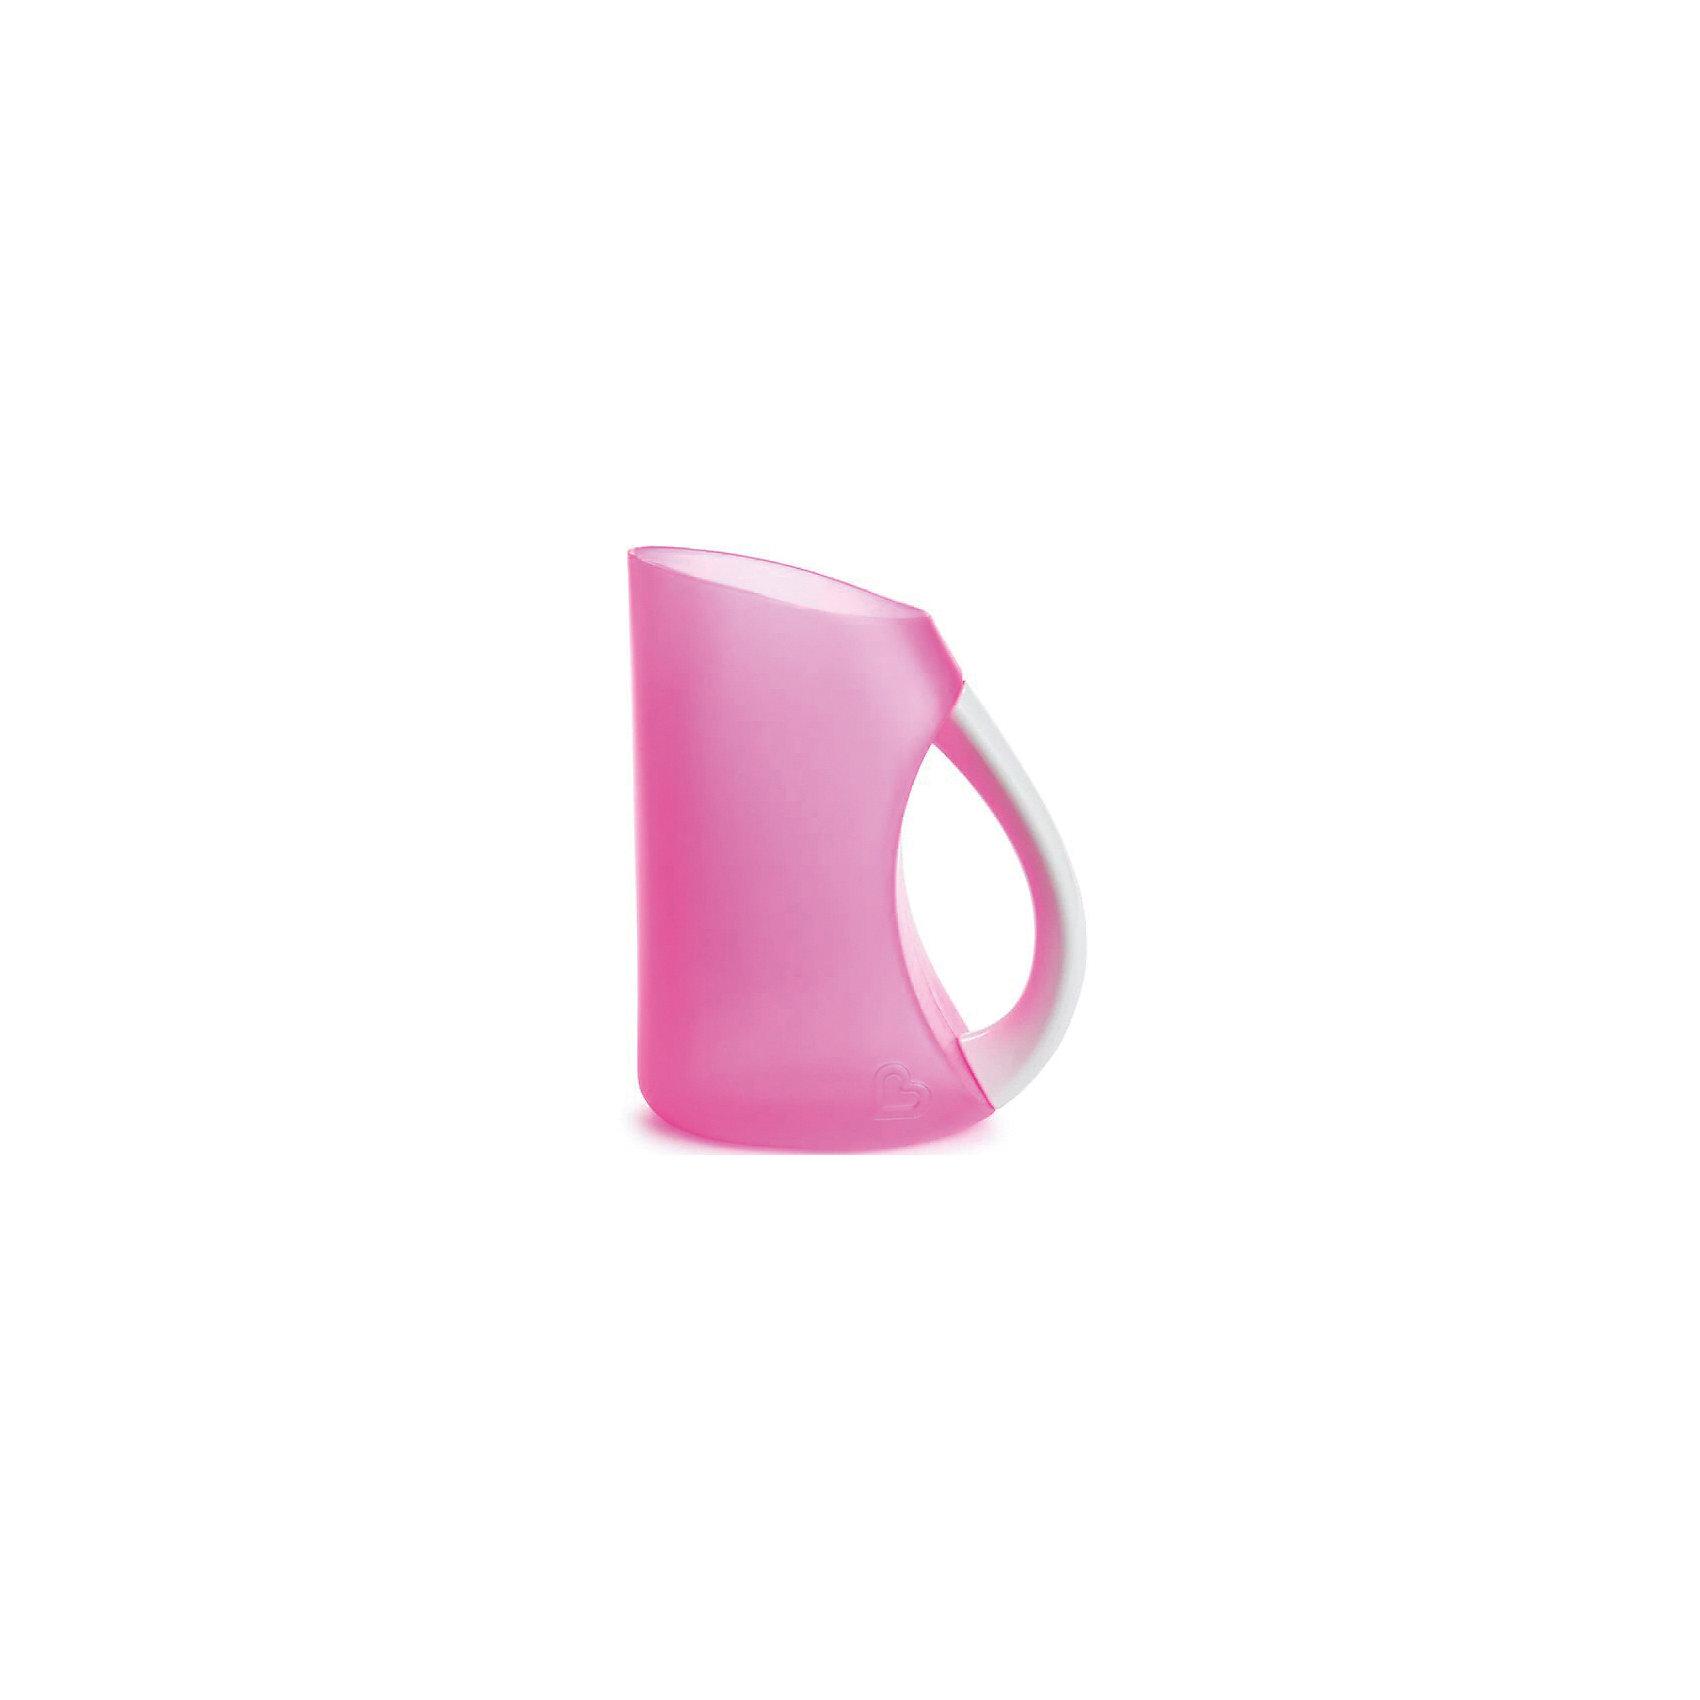 munchkin Мягкий кувшин для мытья волос, munchkin, розовый детский ковшик munchkin мягкий кувшин для мытья волос от 6 мес розовый